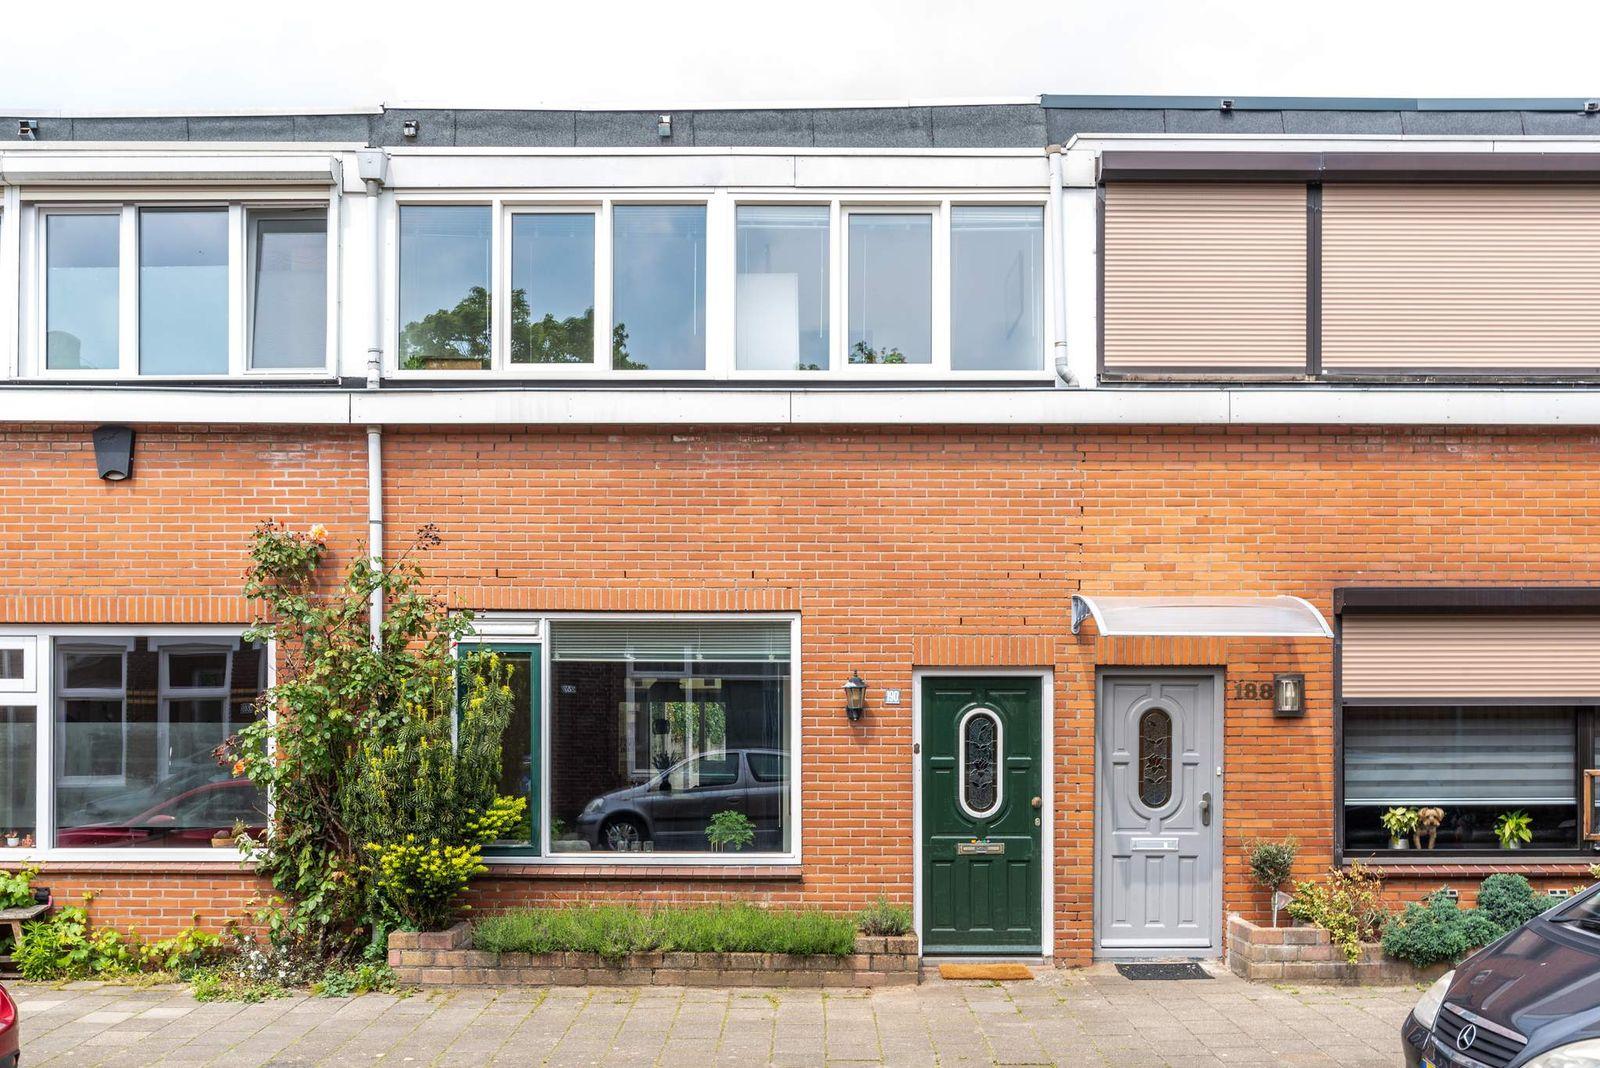 Oude Nonnendaalseweg 190, Nijmegen